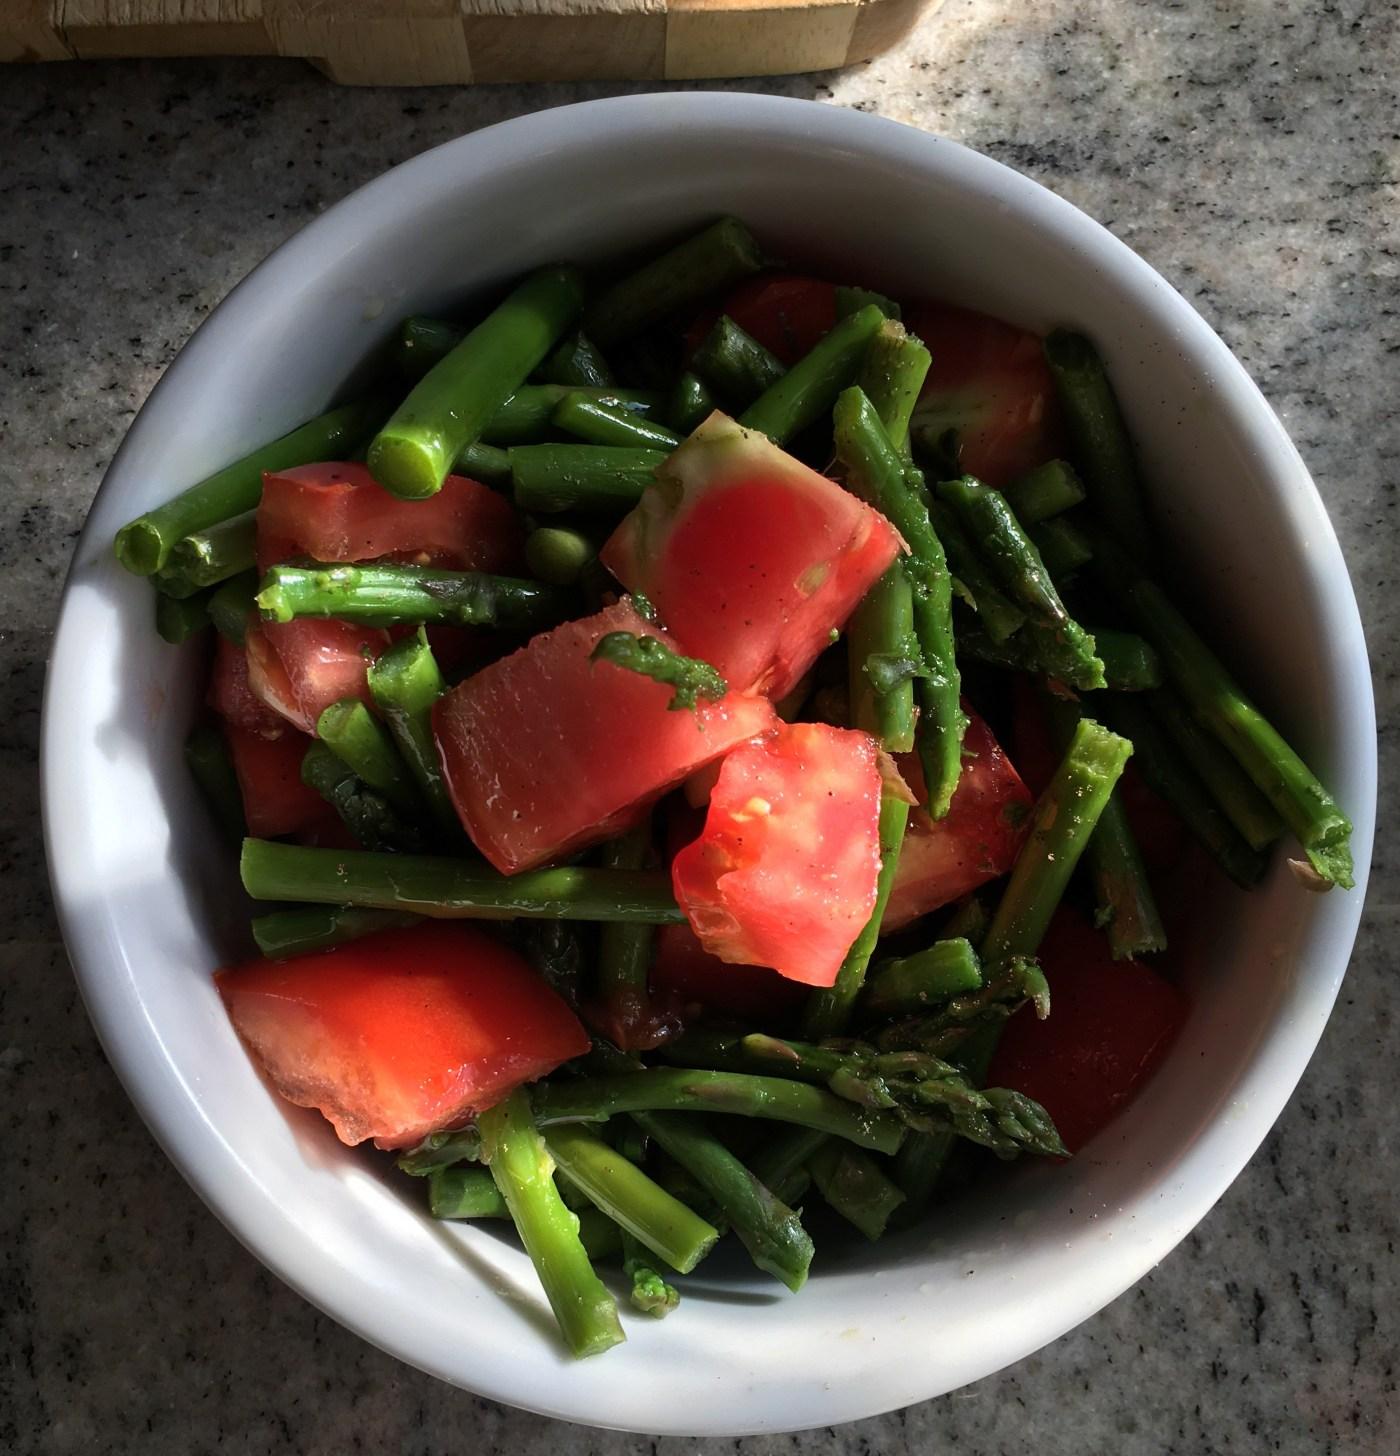 Warm asparagus and tomato salad